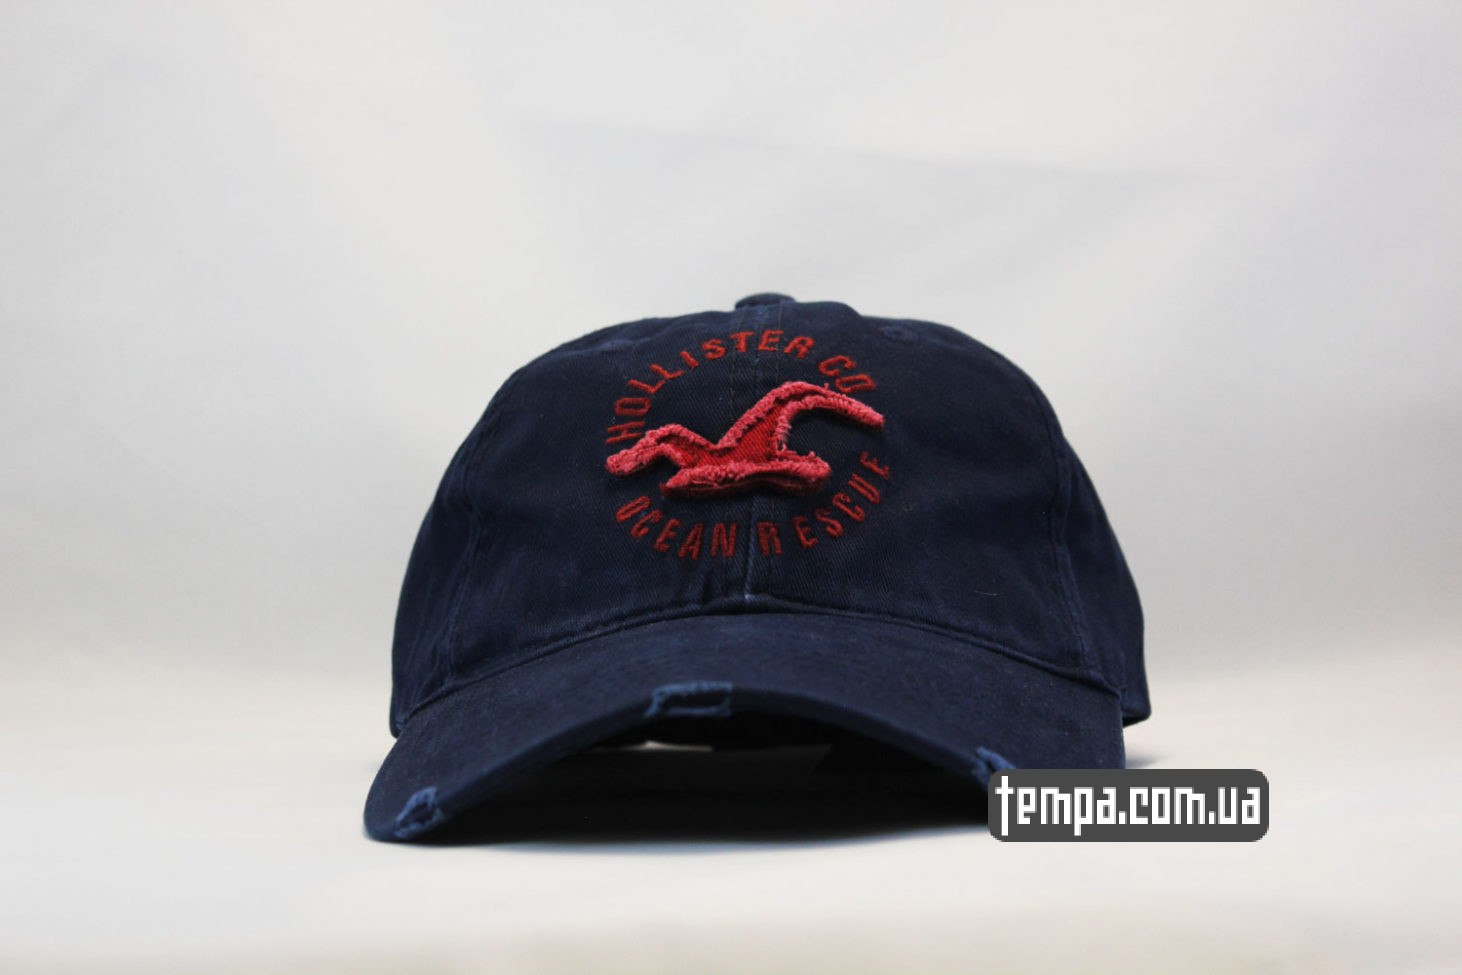 кепка бейсболка holliter co ocean rescue синяя с птицей